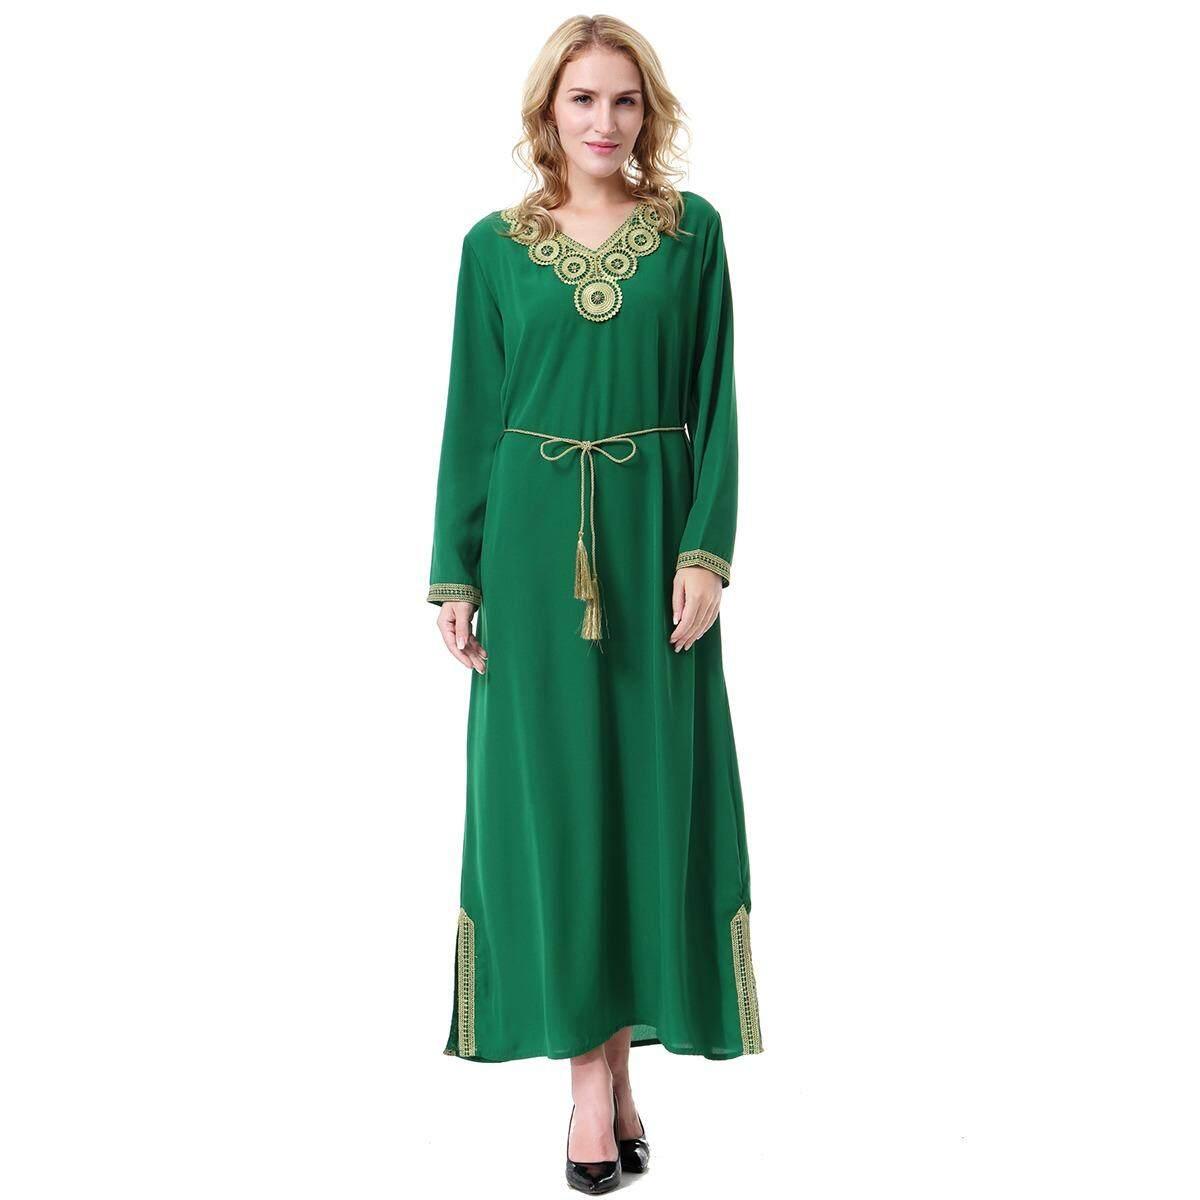 Wanita Lengan Panjang Desain Stiker Appliques Hem Split Muslim Abaya Gaun Pakaian Islami Pakaian Antik Musim Panas Pesta Koktail Gaun Malam Gaun besar Gaun untuk Ramadan Wanita Muslim S-3XL-Internasional